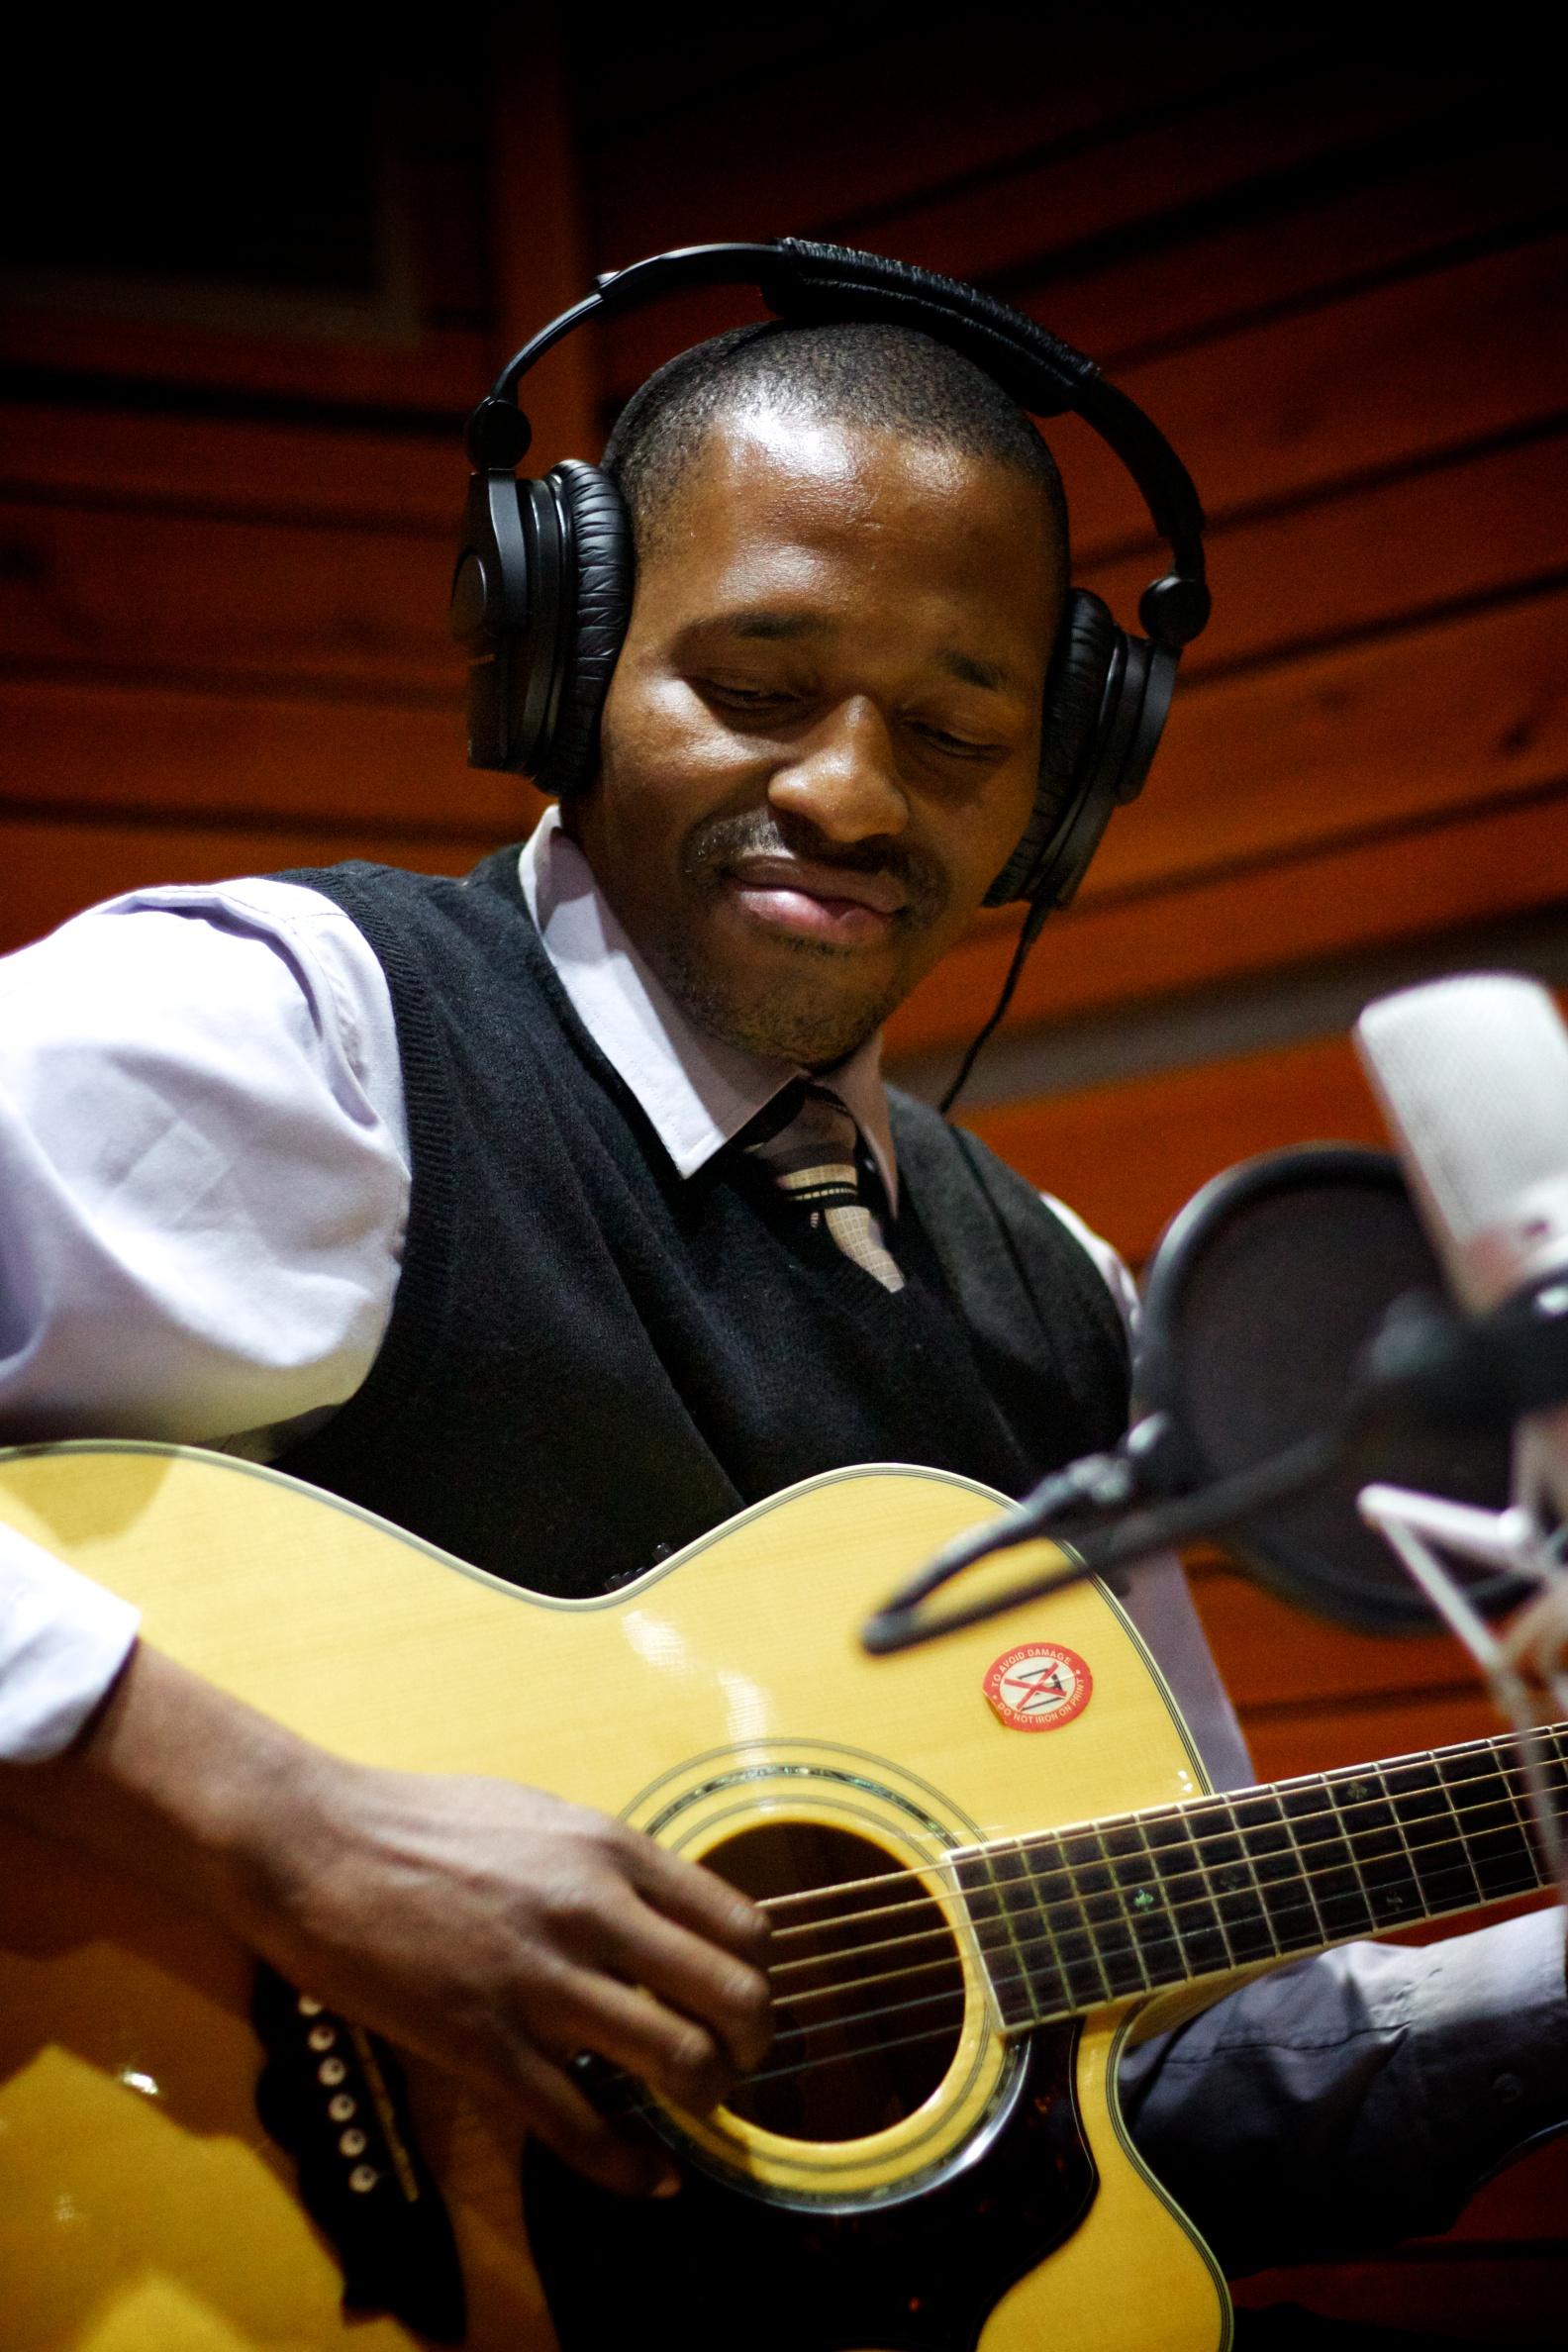 Dusty Simelane recording a track for the new Lusweti album Sitawuphumelela - Songs of Hope (1).jpg